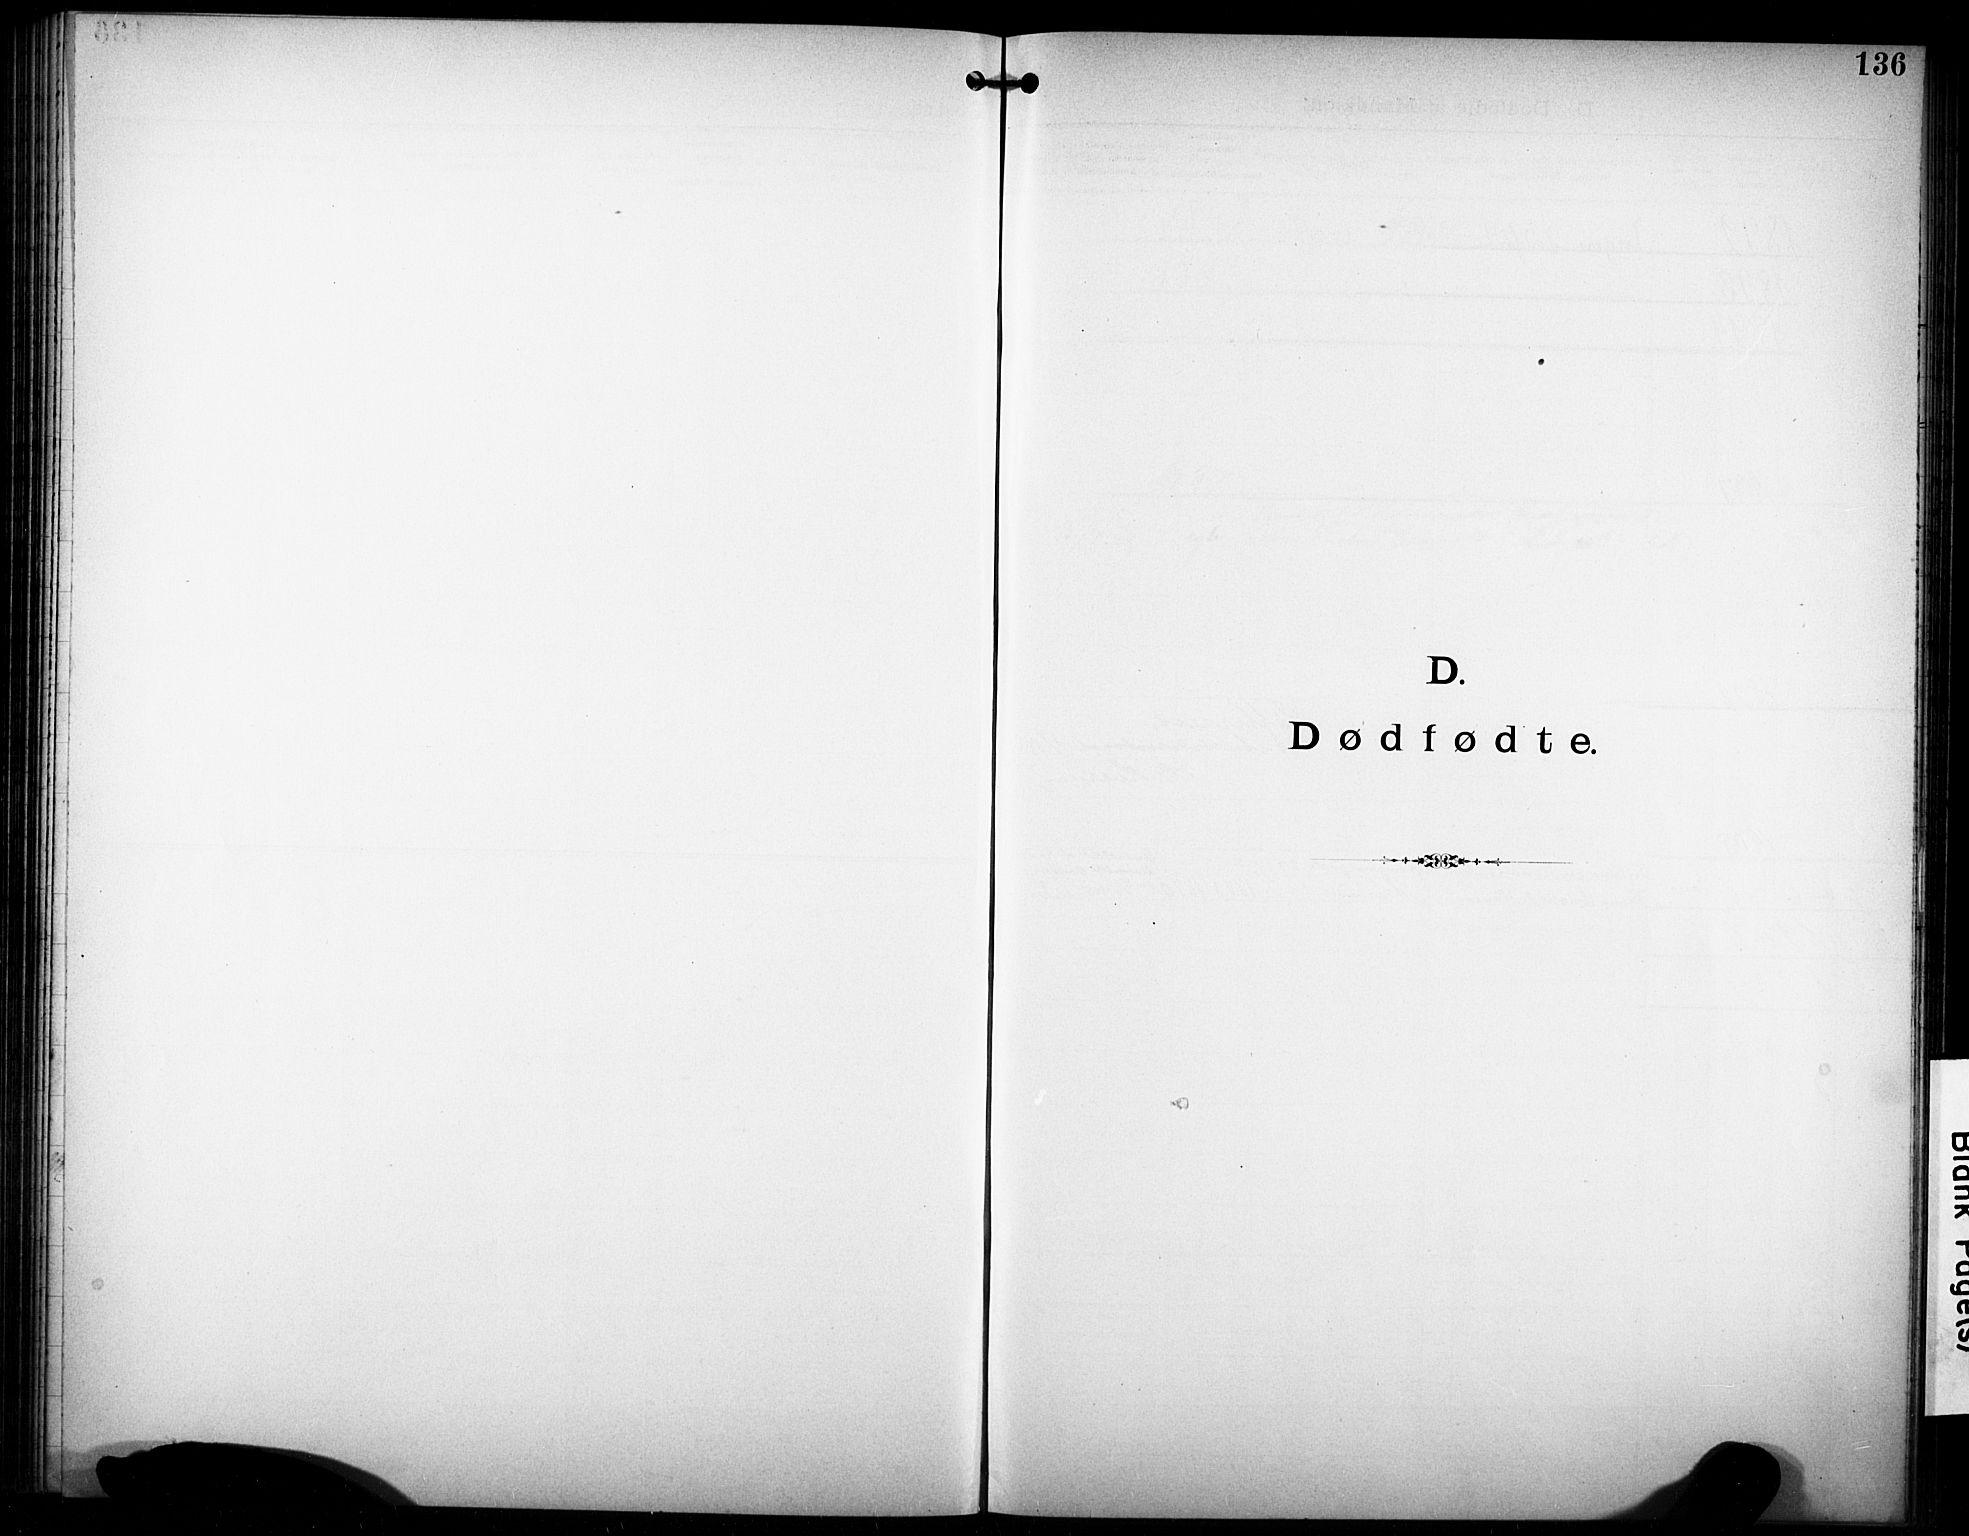 SAKO, Den katolsk-apostoliske menighet i Larvik, F/Fa/L0001: Dissenterprotokoll nr. 1, 1892-1933, s. 136